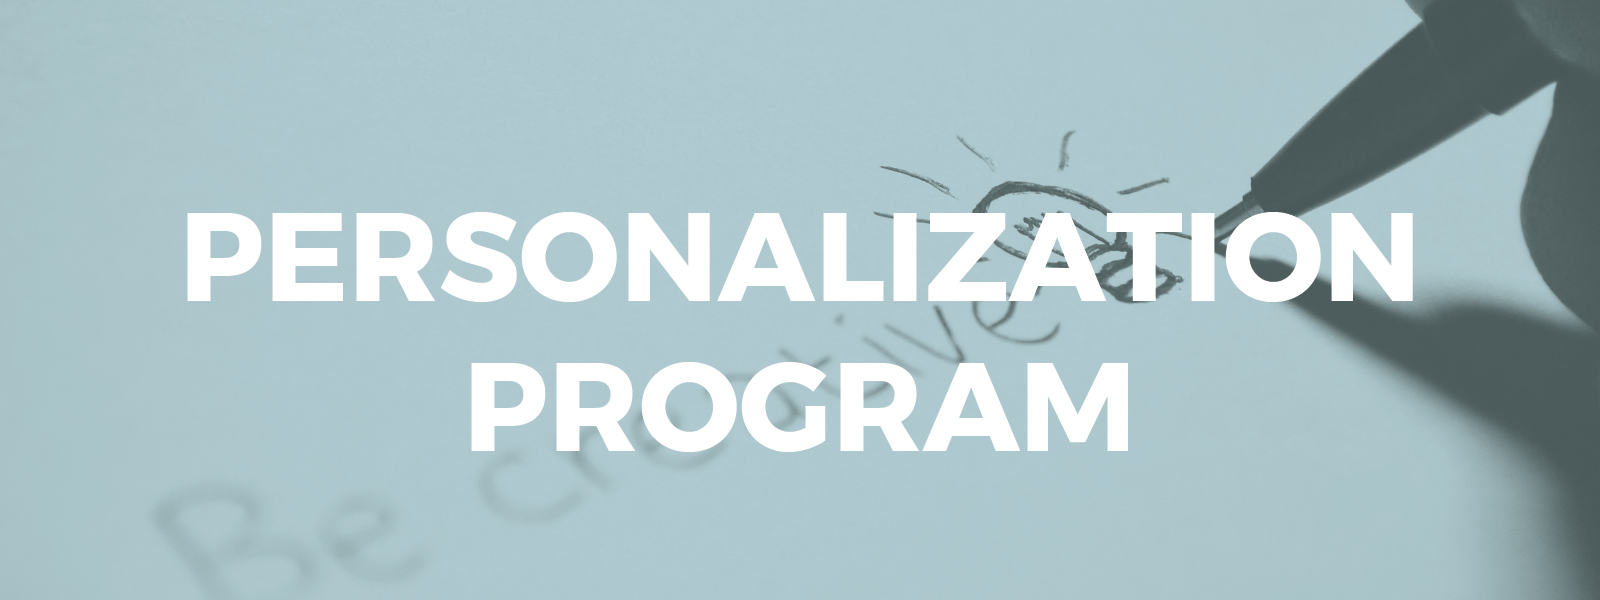 Personalization-Program-DecisionDesigns